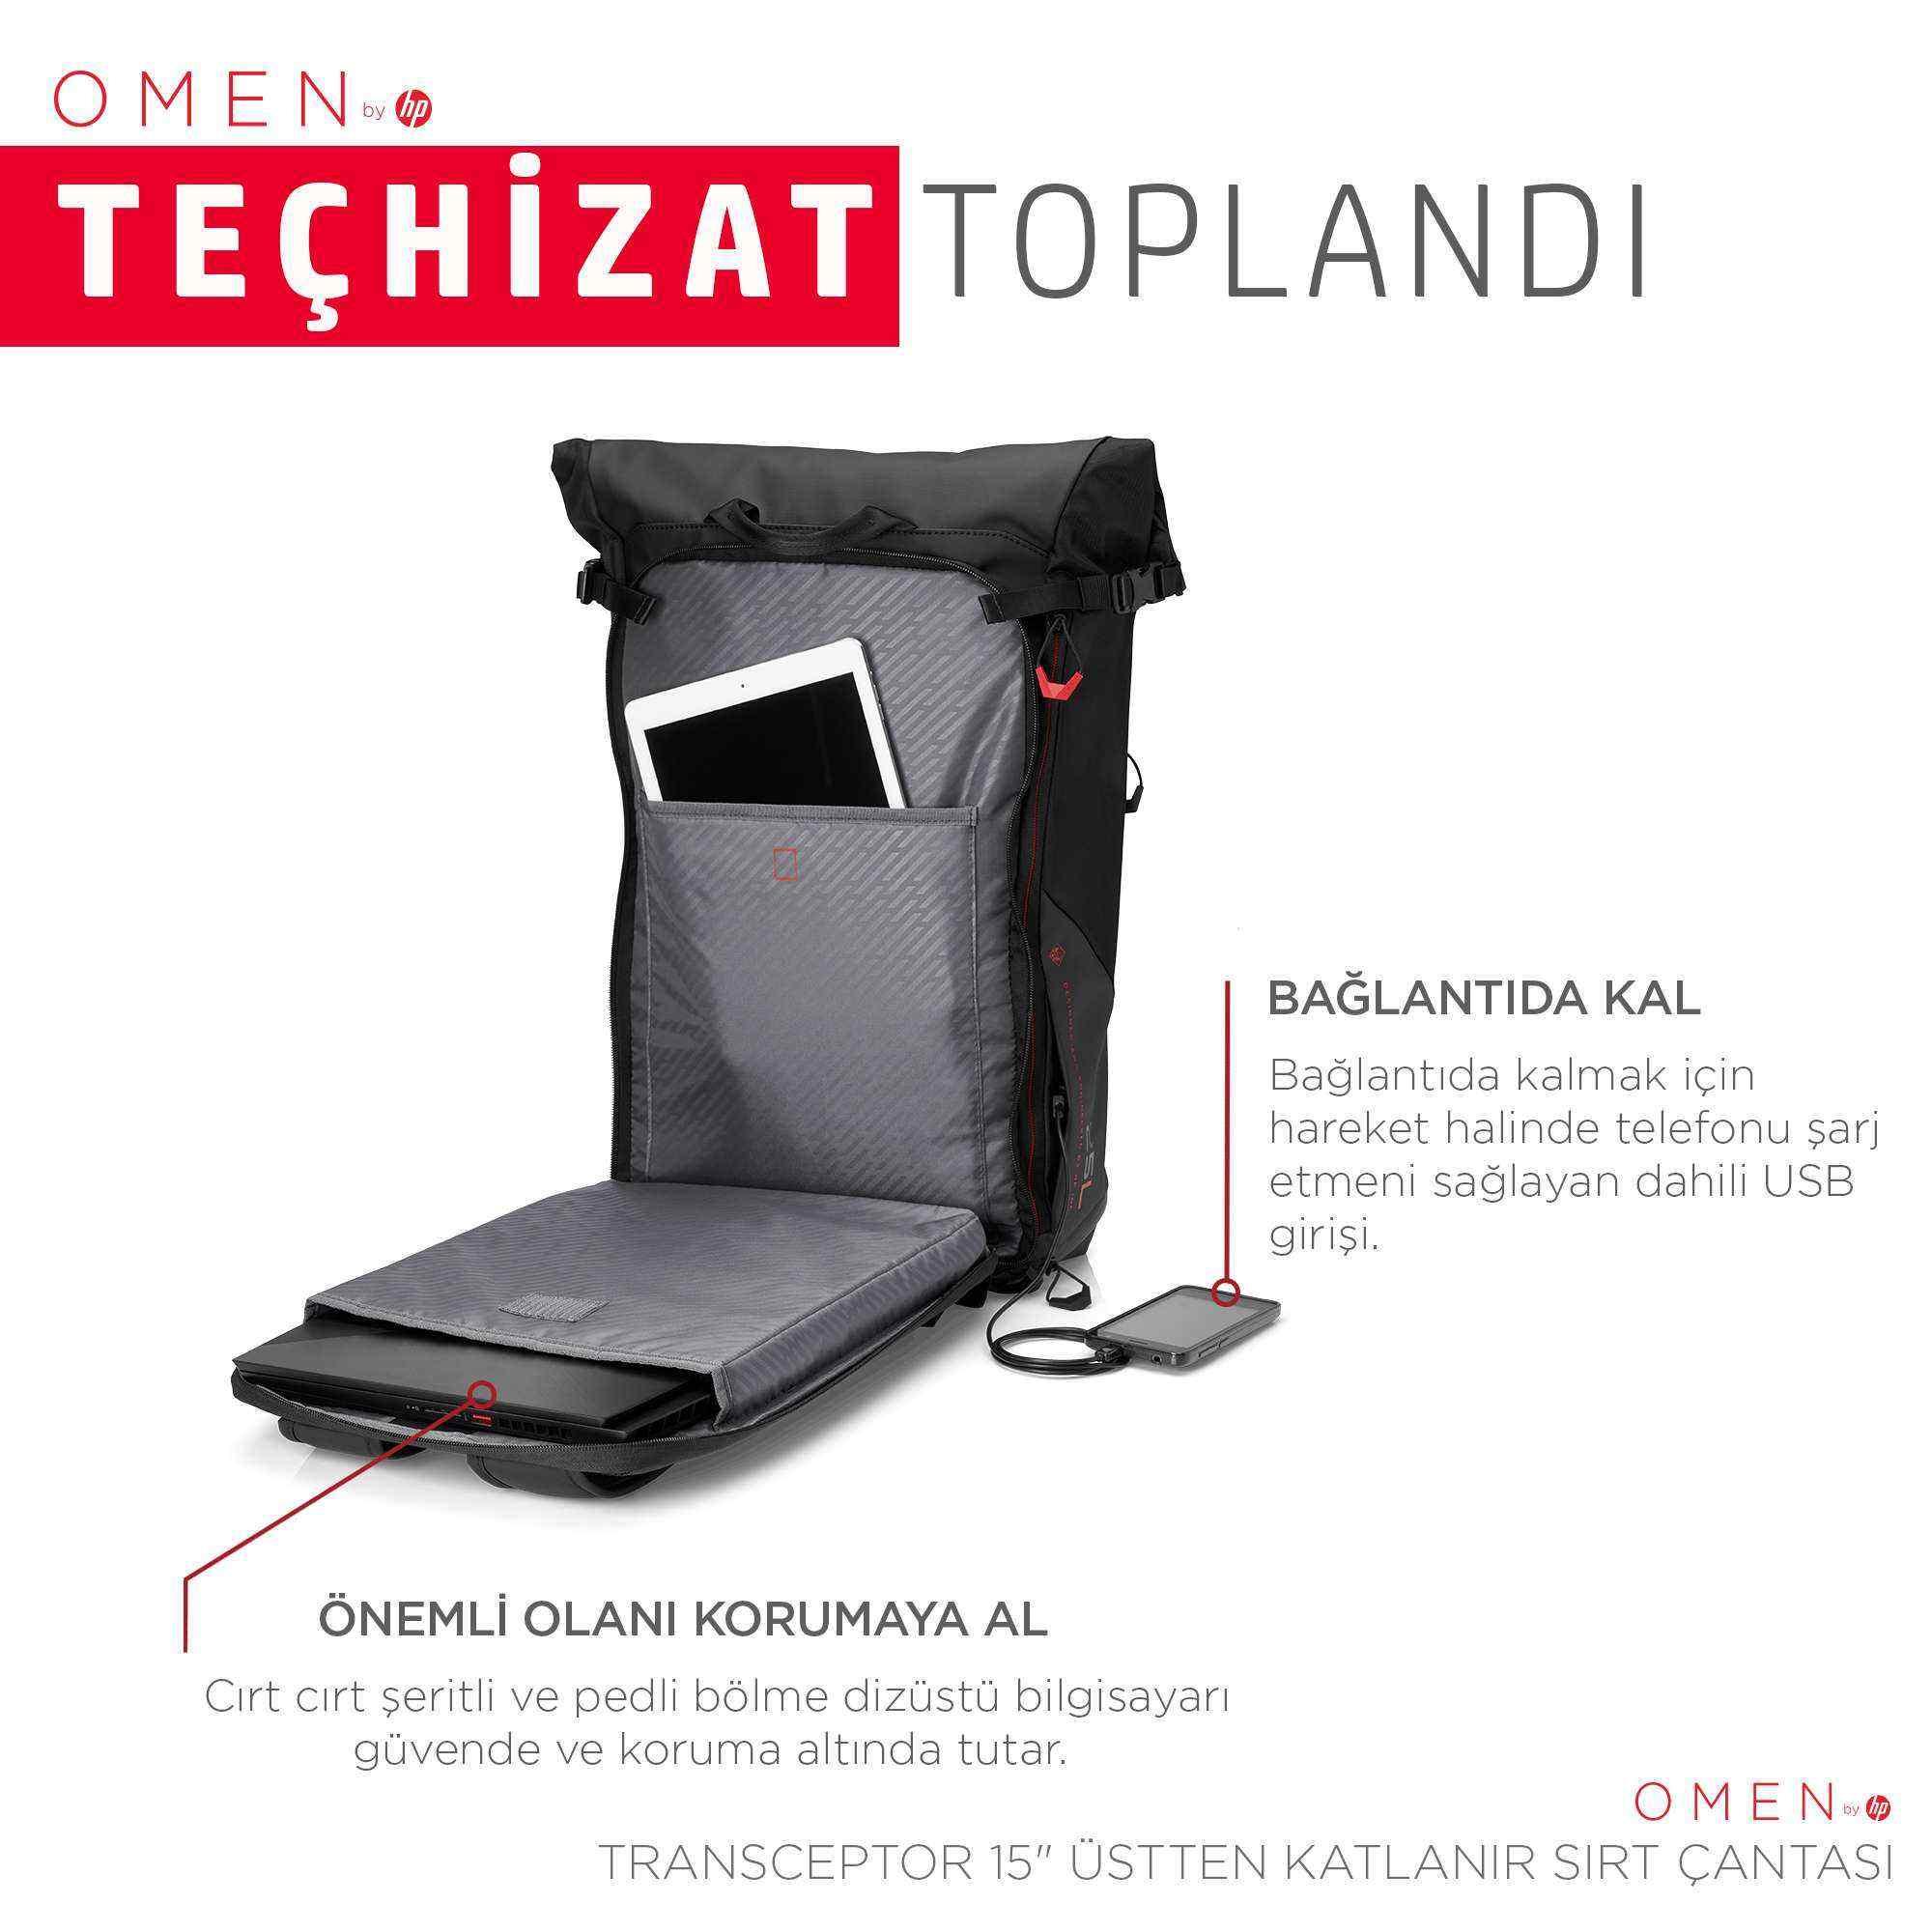 OMEN Transceptor Rolltop 15.6 inç Gaming Bilgisayar Sırt Çantası 25L - Siyah